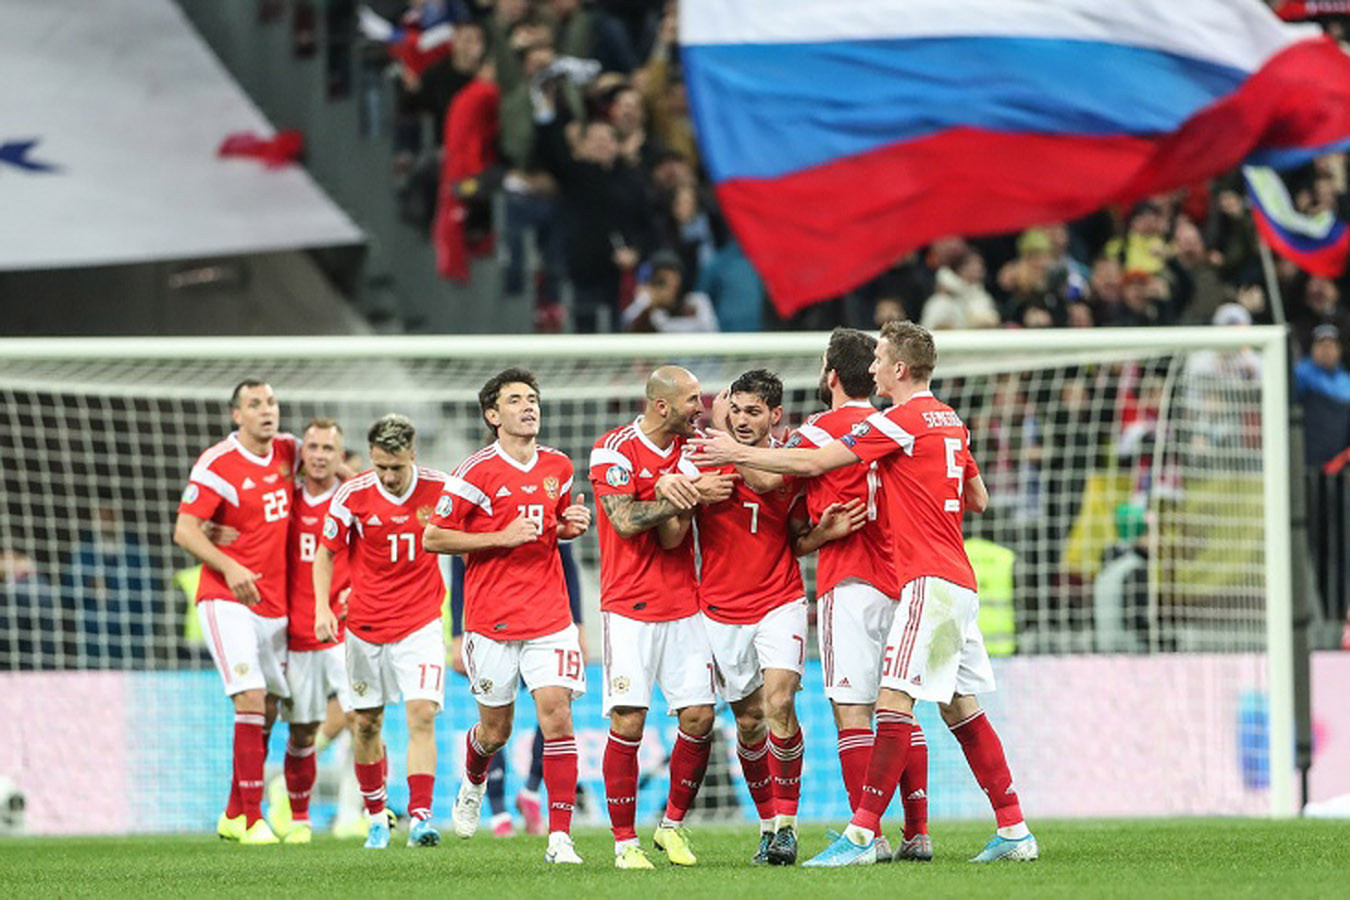 История английский футбол скандалы